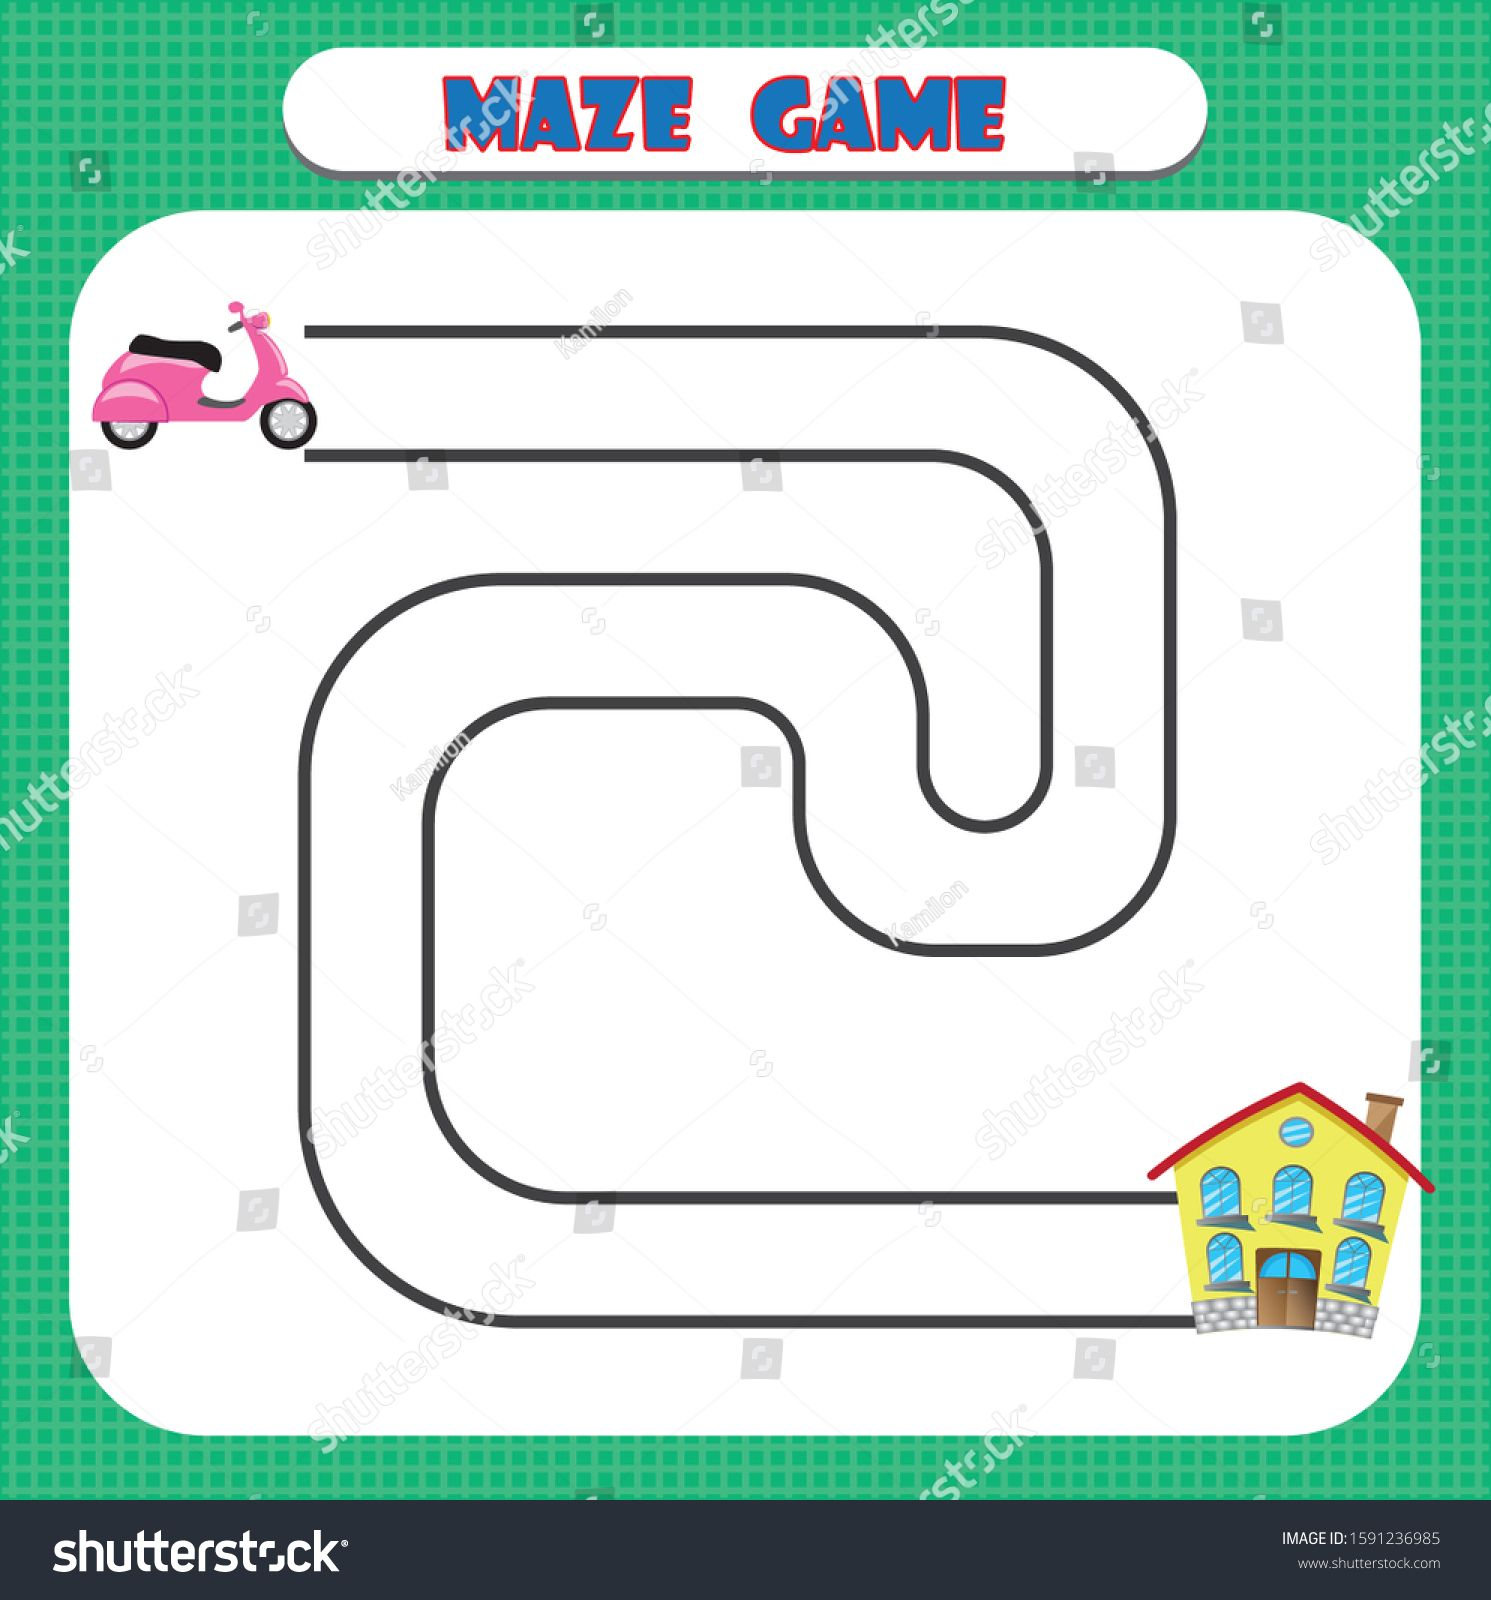 Maze Game For Children Education Developing Worksheet Ad